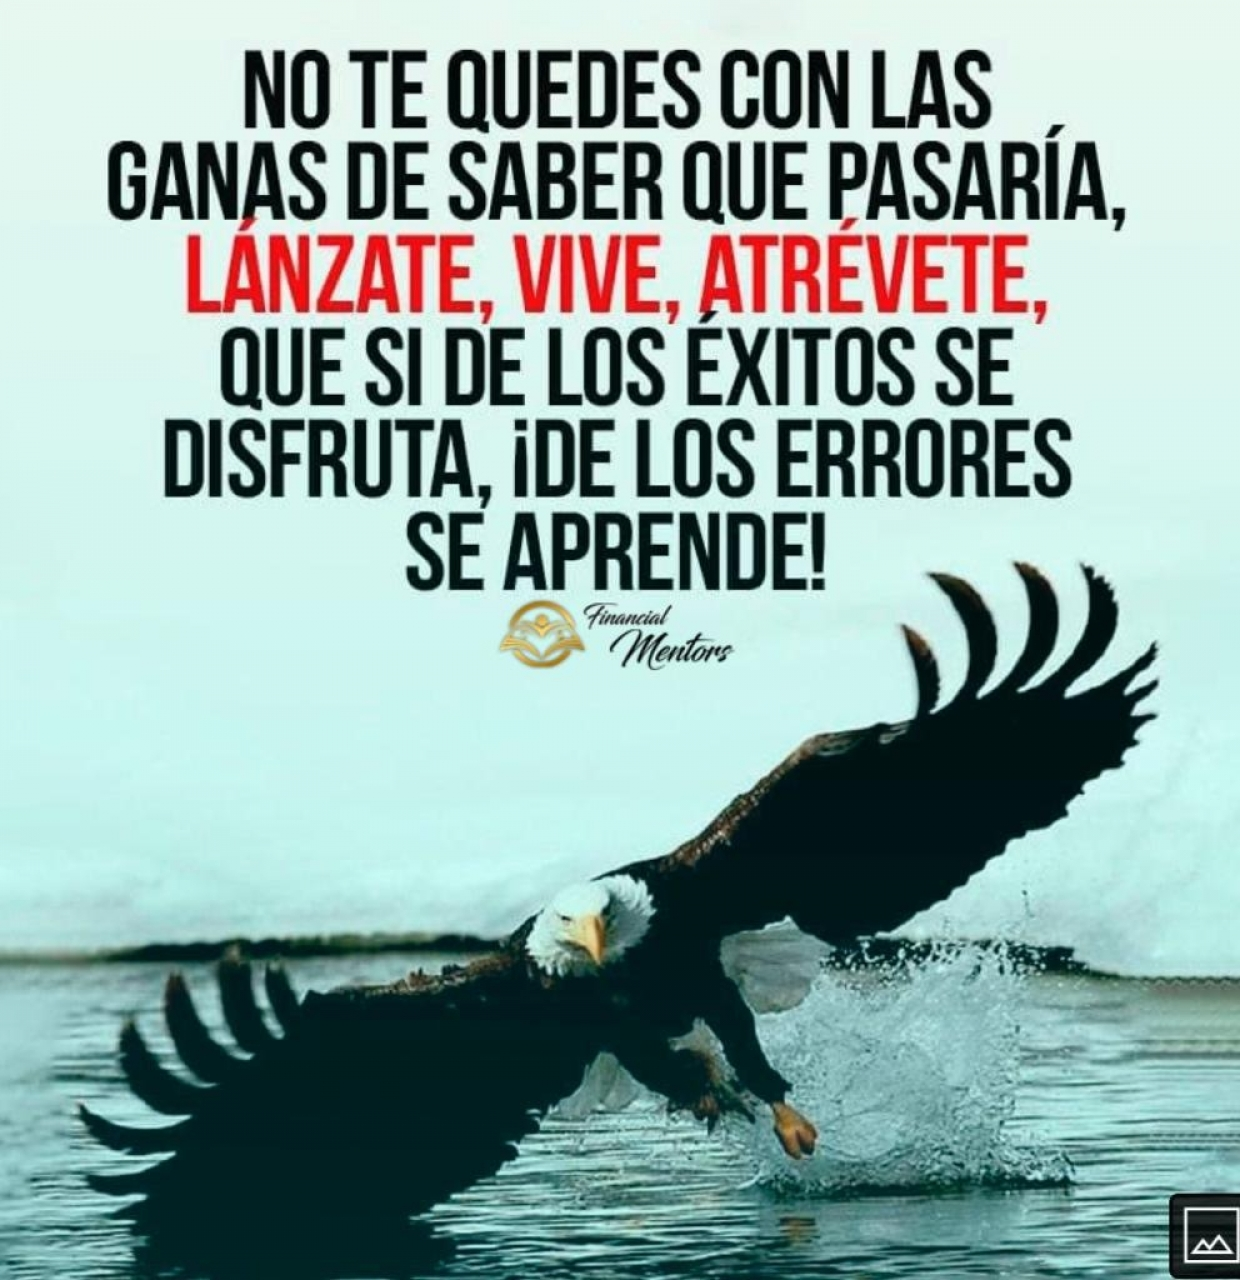 Atrevete comoAguila 2020-11-07